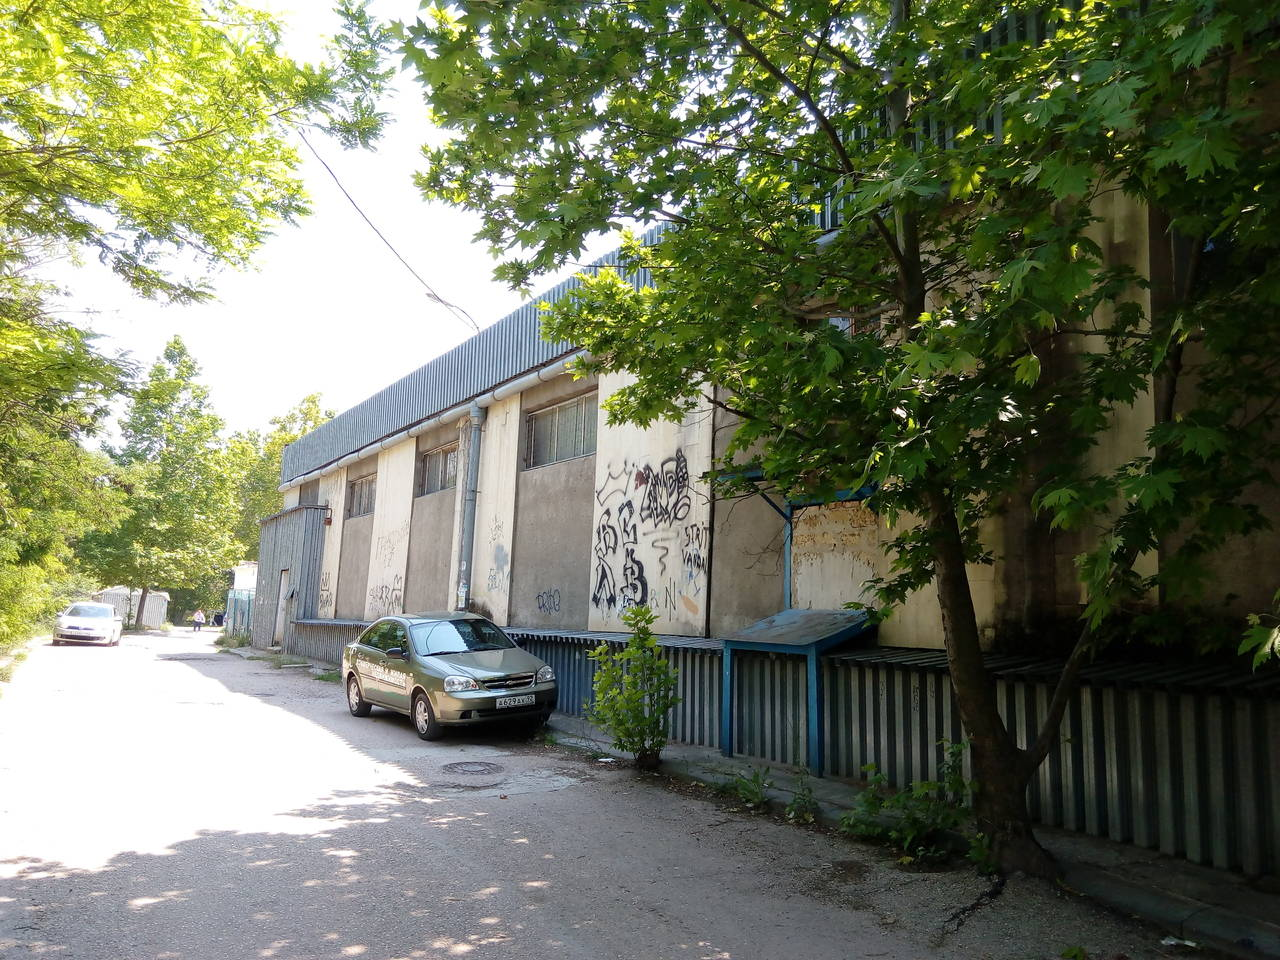 г Севастополь, пр-кт Победы, д 6А